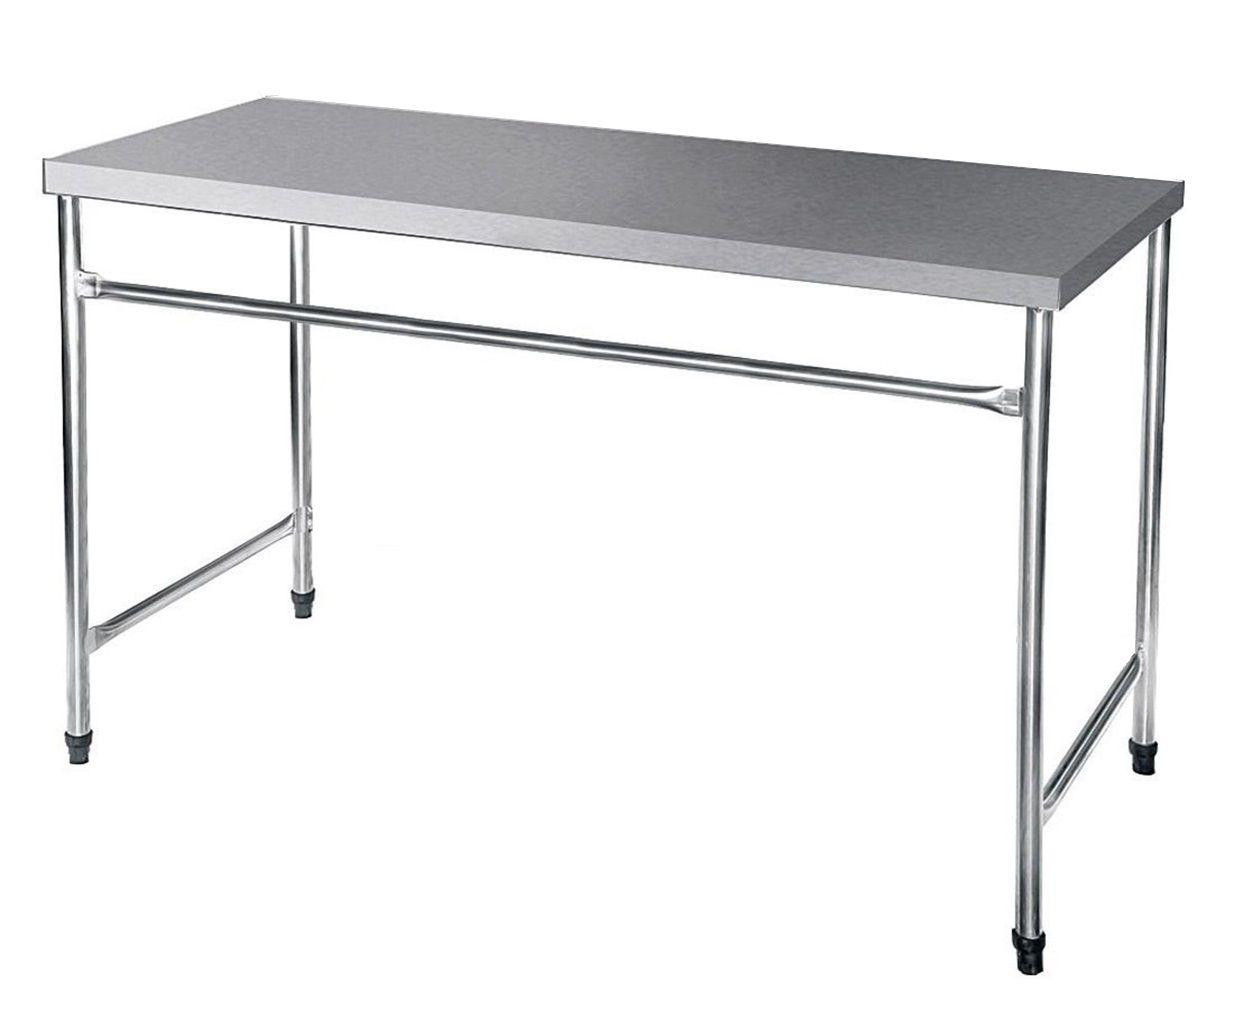 Bancada / Mesa Em Aço Inox (100x60x85)